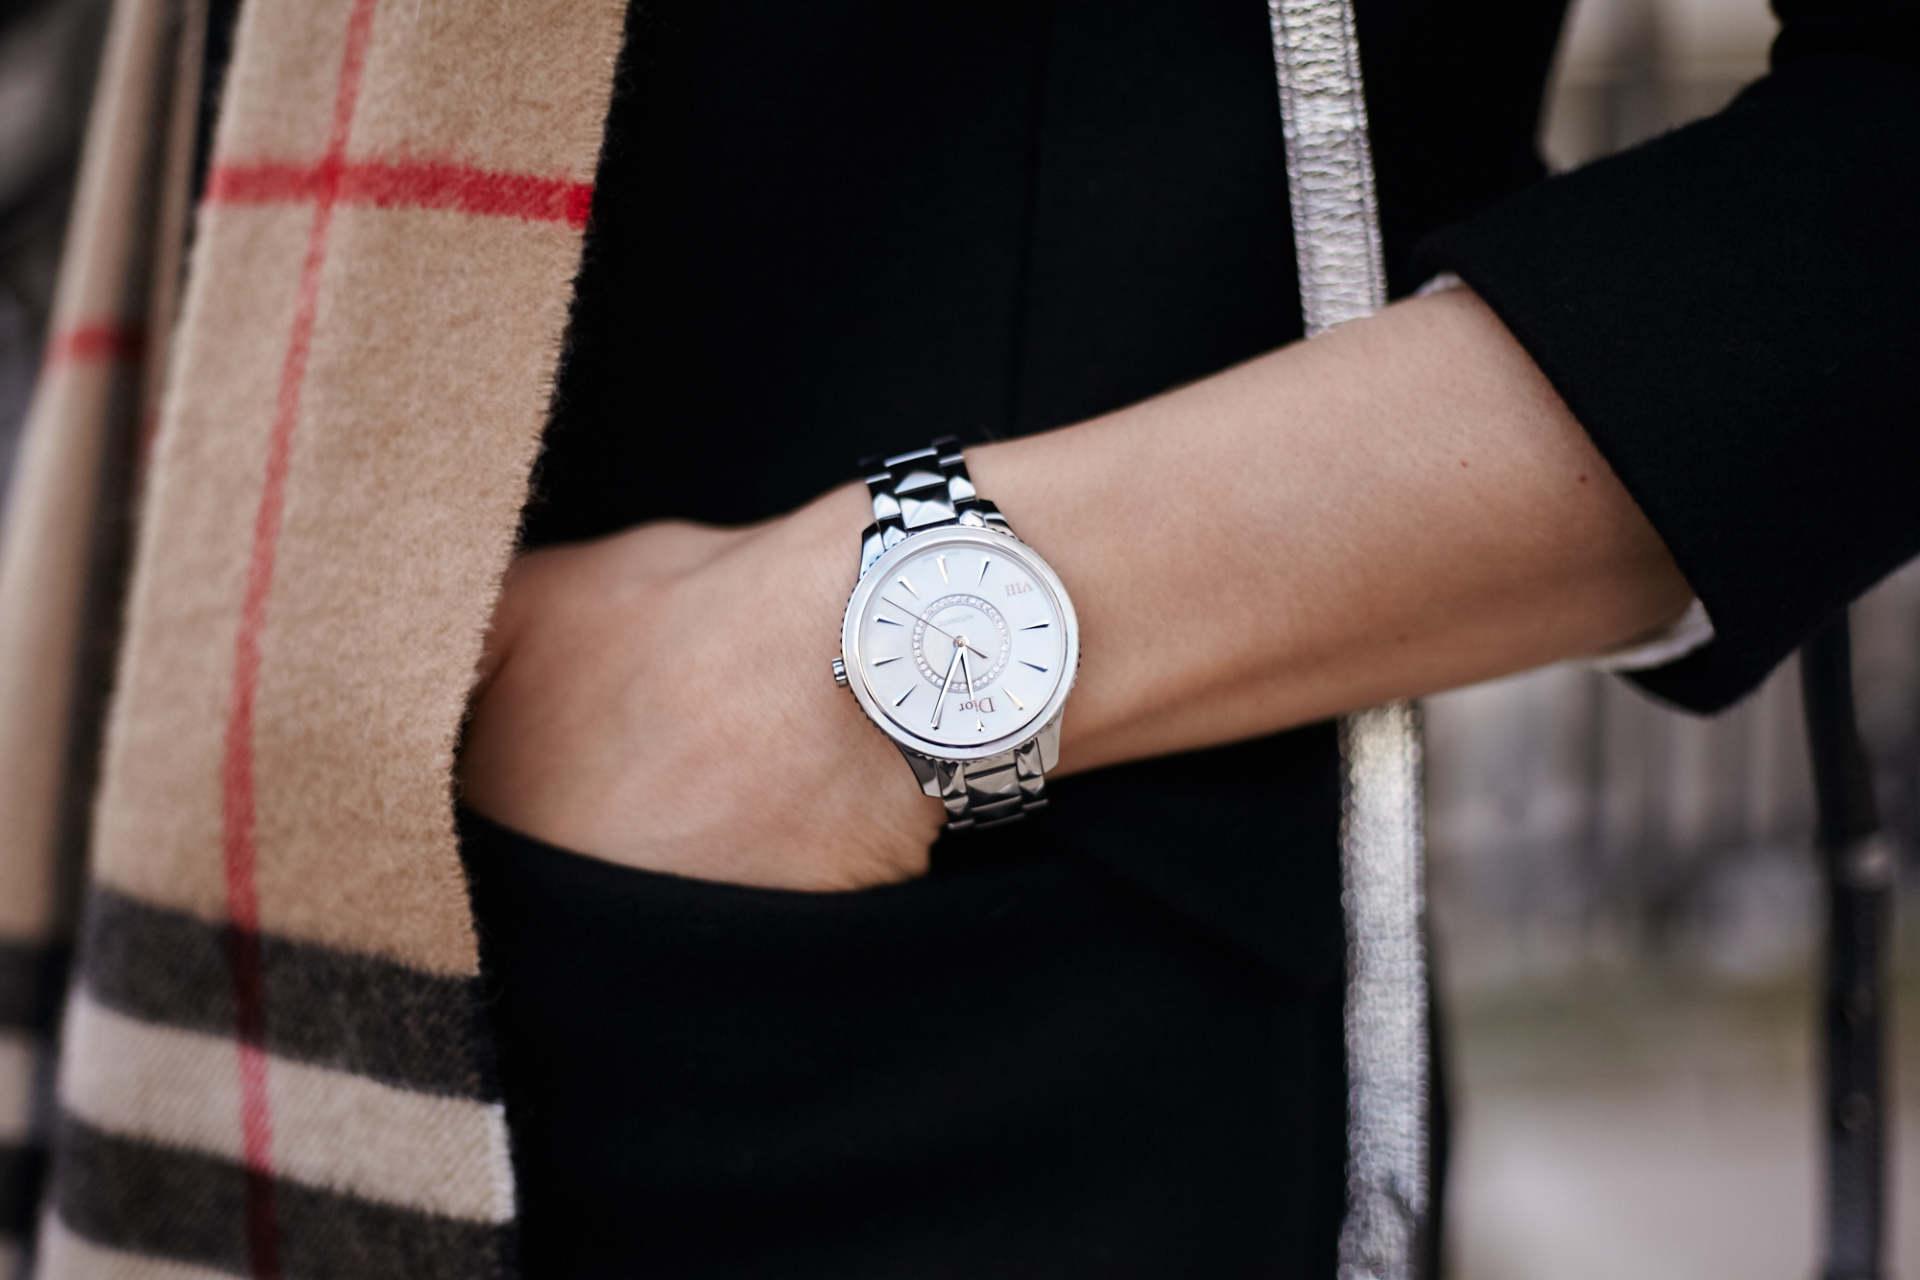 dior montaigne automatic watch